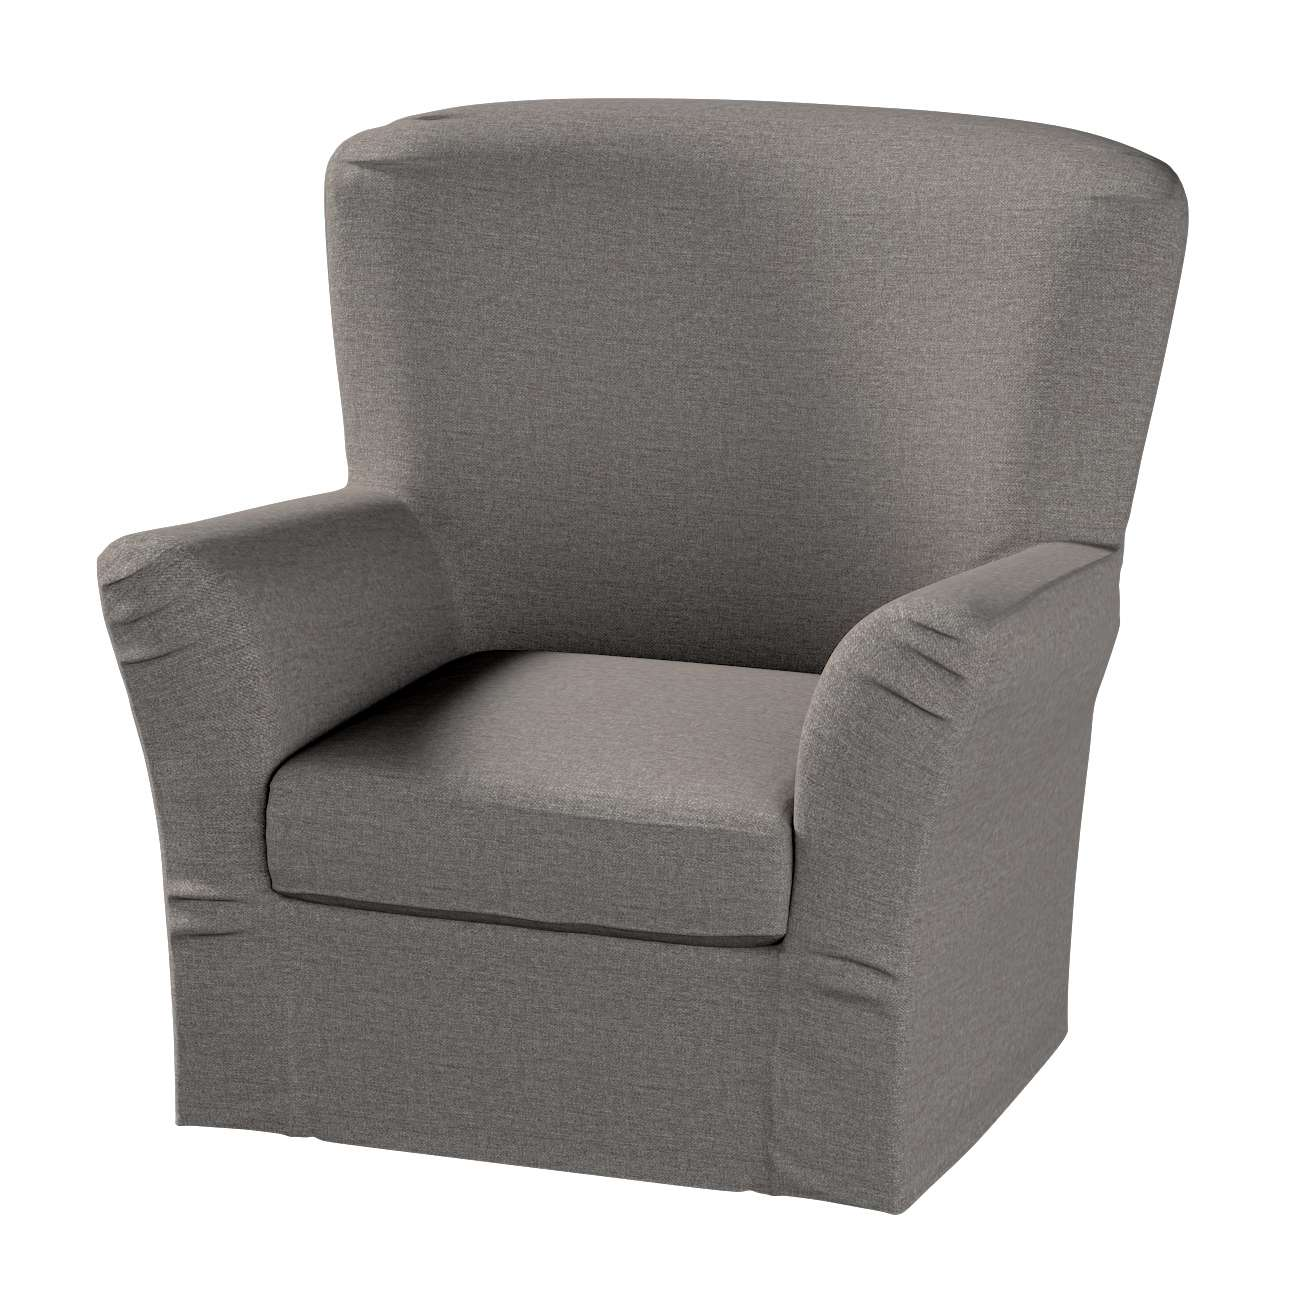 TOMELILLA fotelio užvalkalas TOMELILLA fotelis kolekcijoje Edinburgh , audinys: 115-77